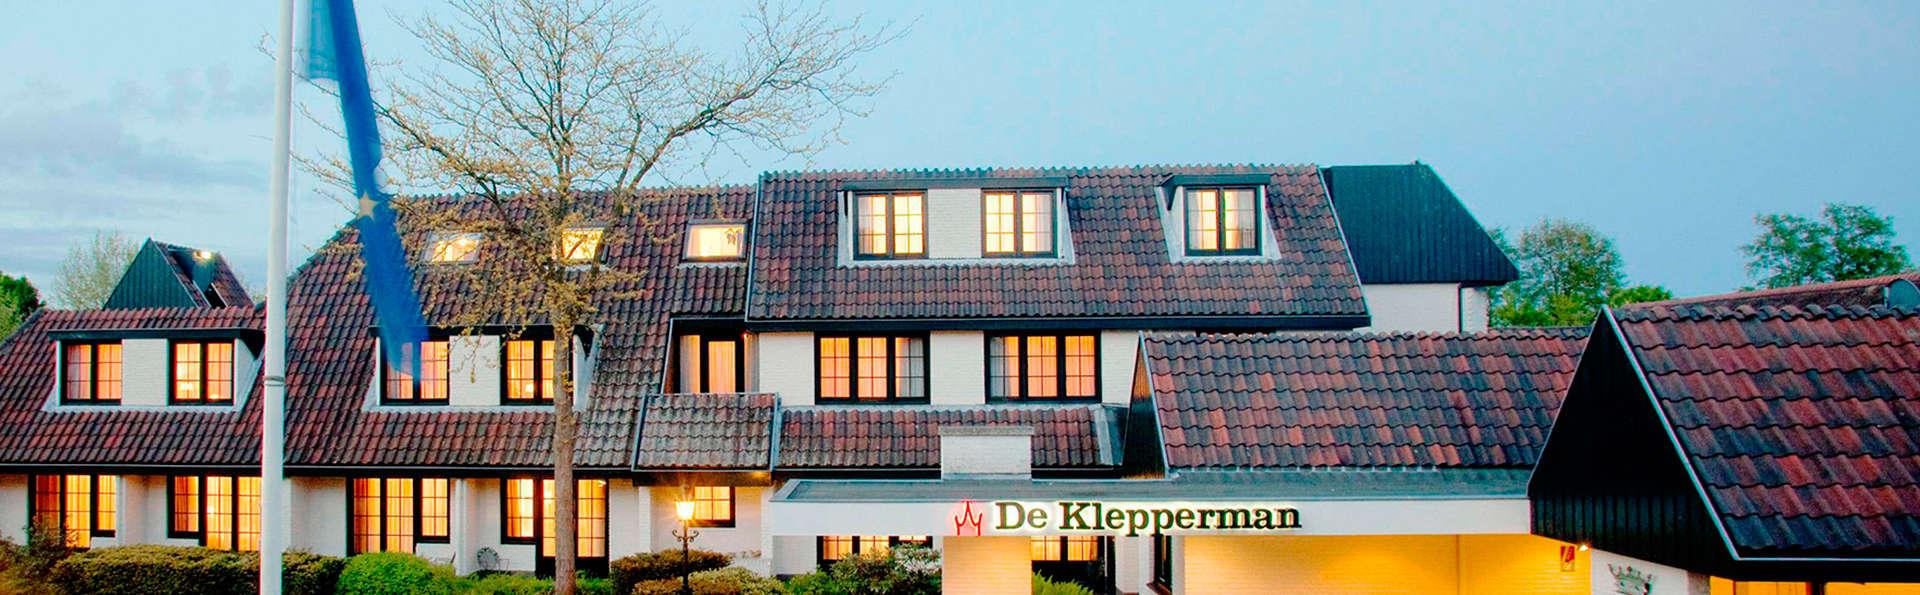 Bilderberg Hotel De Klepperman - edit_front5.jpg